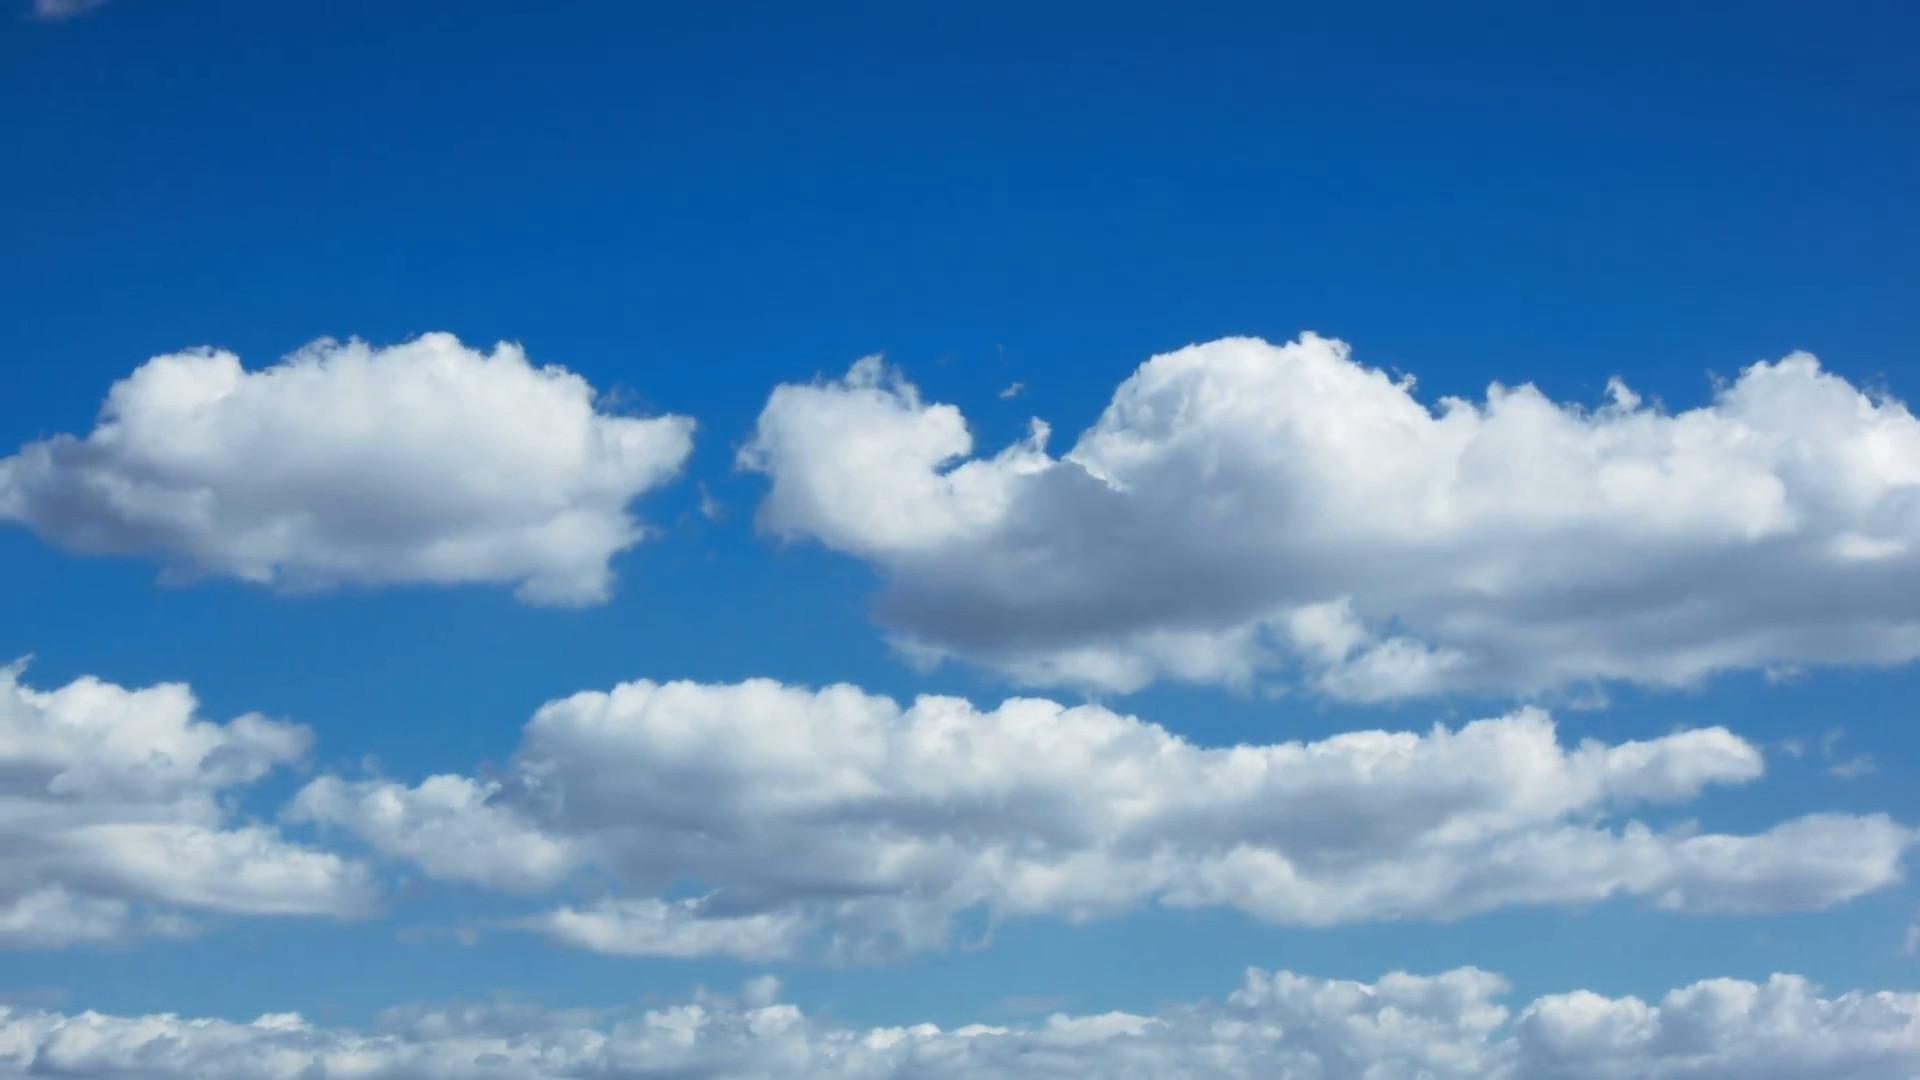 Clouds with blue sky ~ Photos ~ Creative Market  |Light Blue Sky Clouds